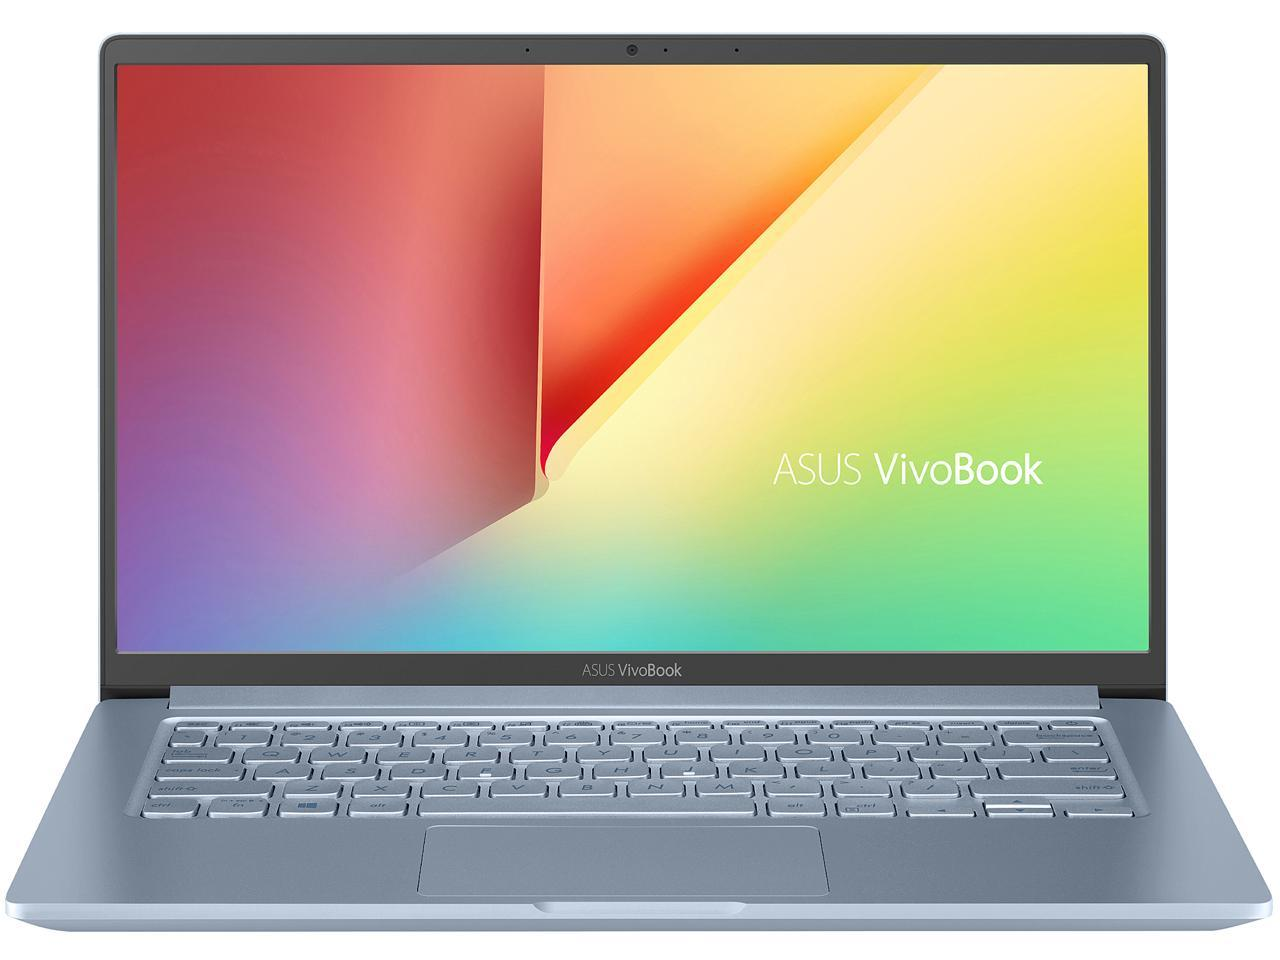 ASUS Laptop VivoBook S14 S403JA-PH51 14″ Laptop, 10th Gen Core i5, 8GB RAM, 256GB SSD